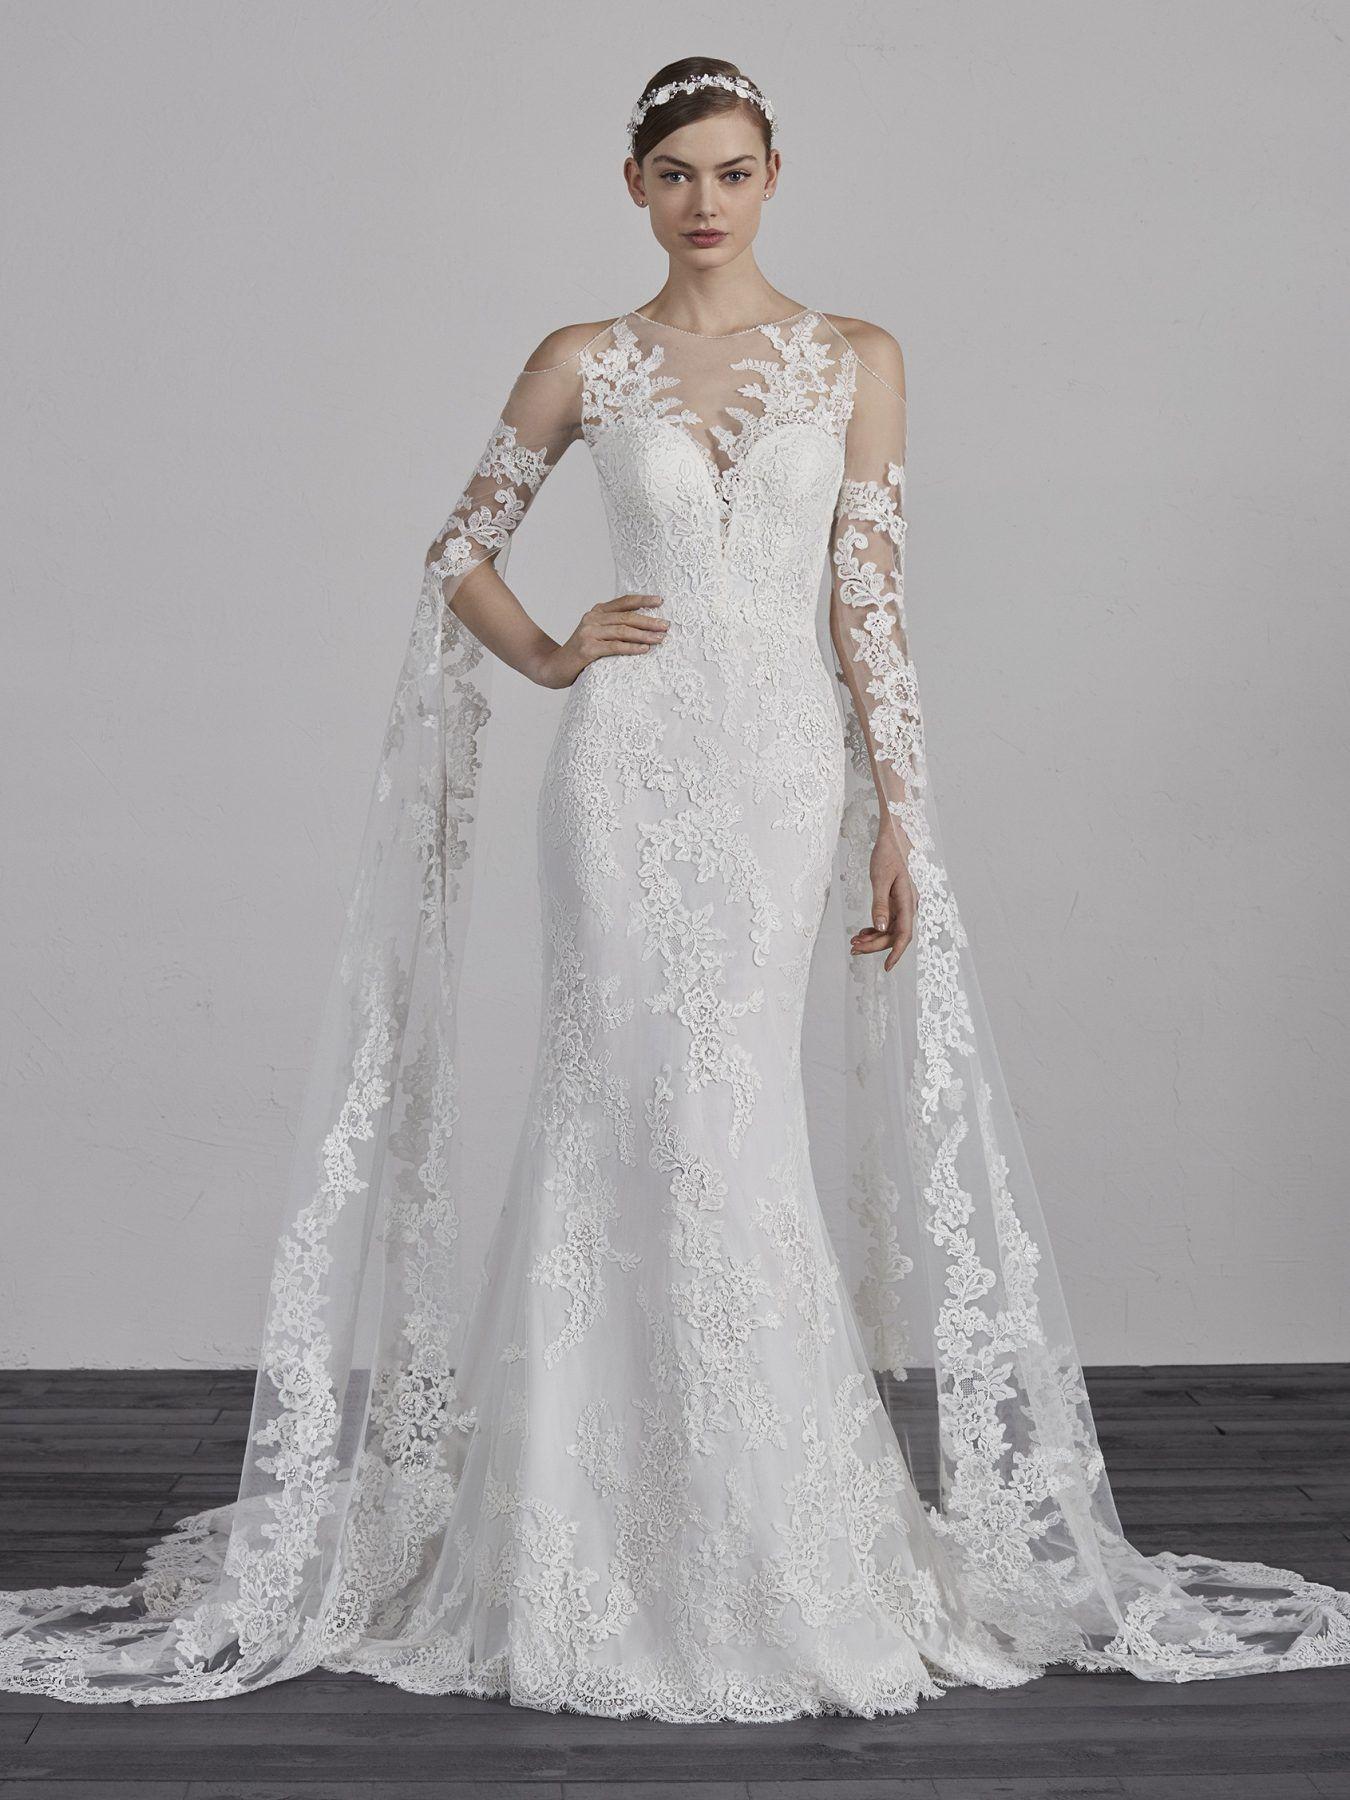 Long Sleeve Lace Illusion Cold Shoulder Mermaid Wedding Dress Pronovias Style Eriadu Wedding Dress Long Sleeve Ball Gowns Wedding Pronovias Wedding Dress